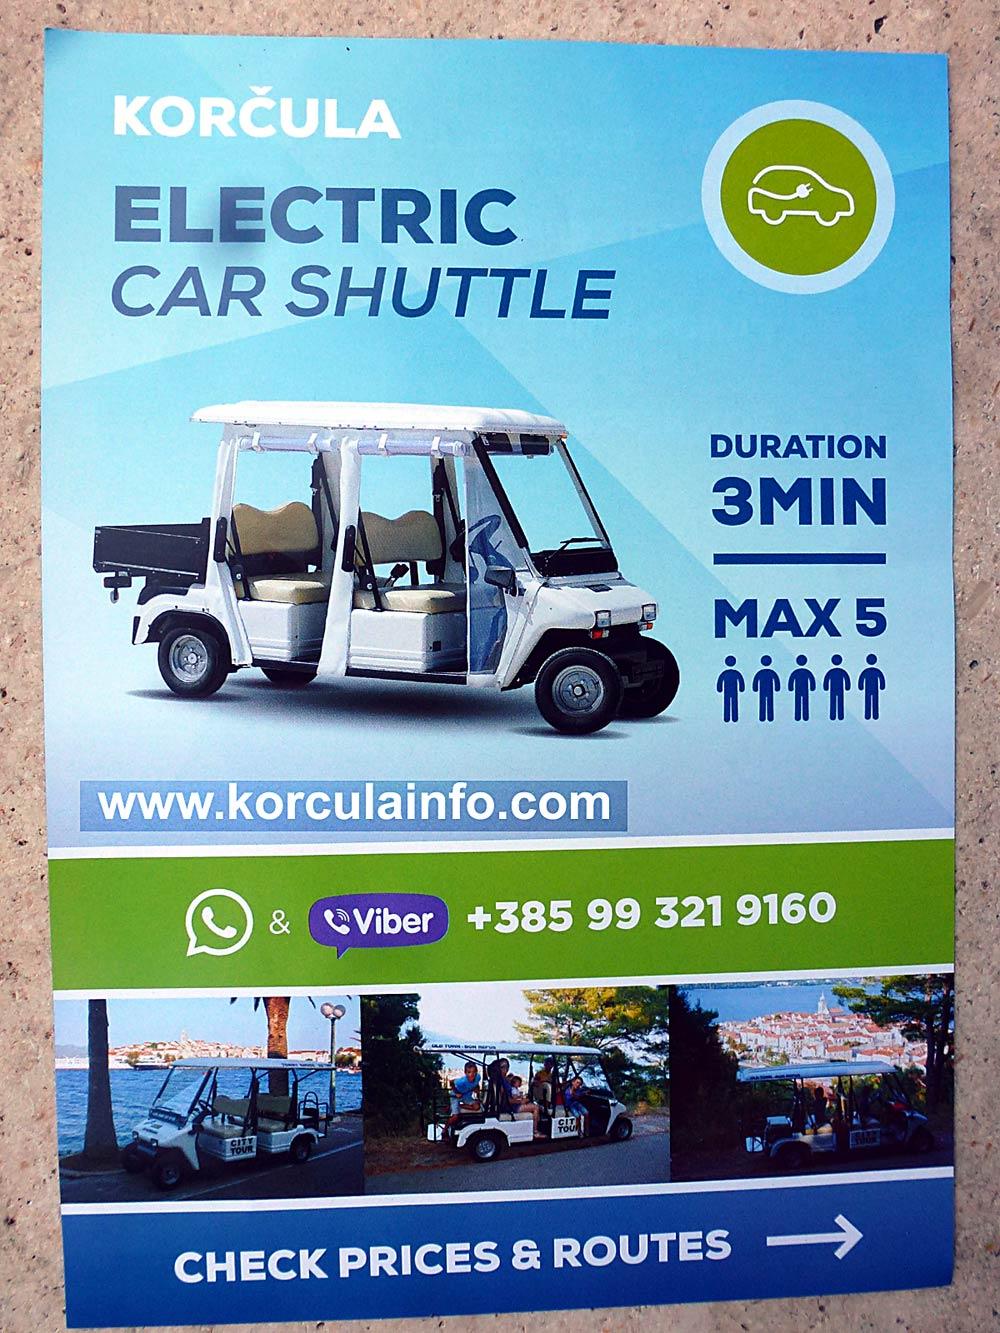 electric-car-shuttle-korcula1